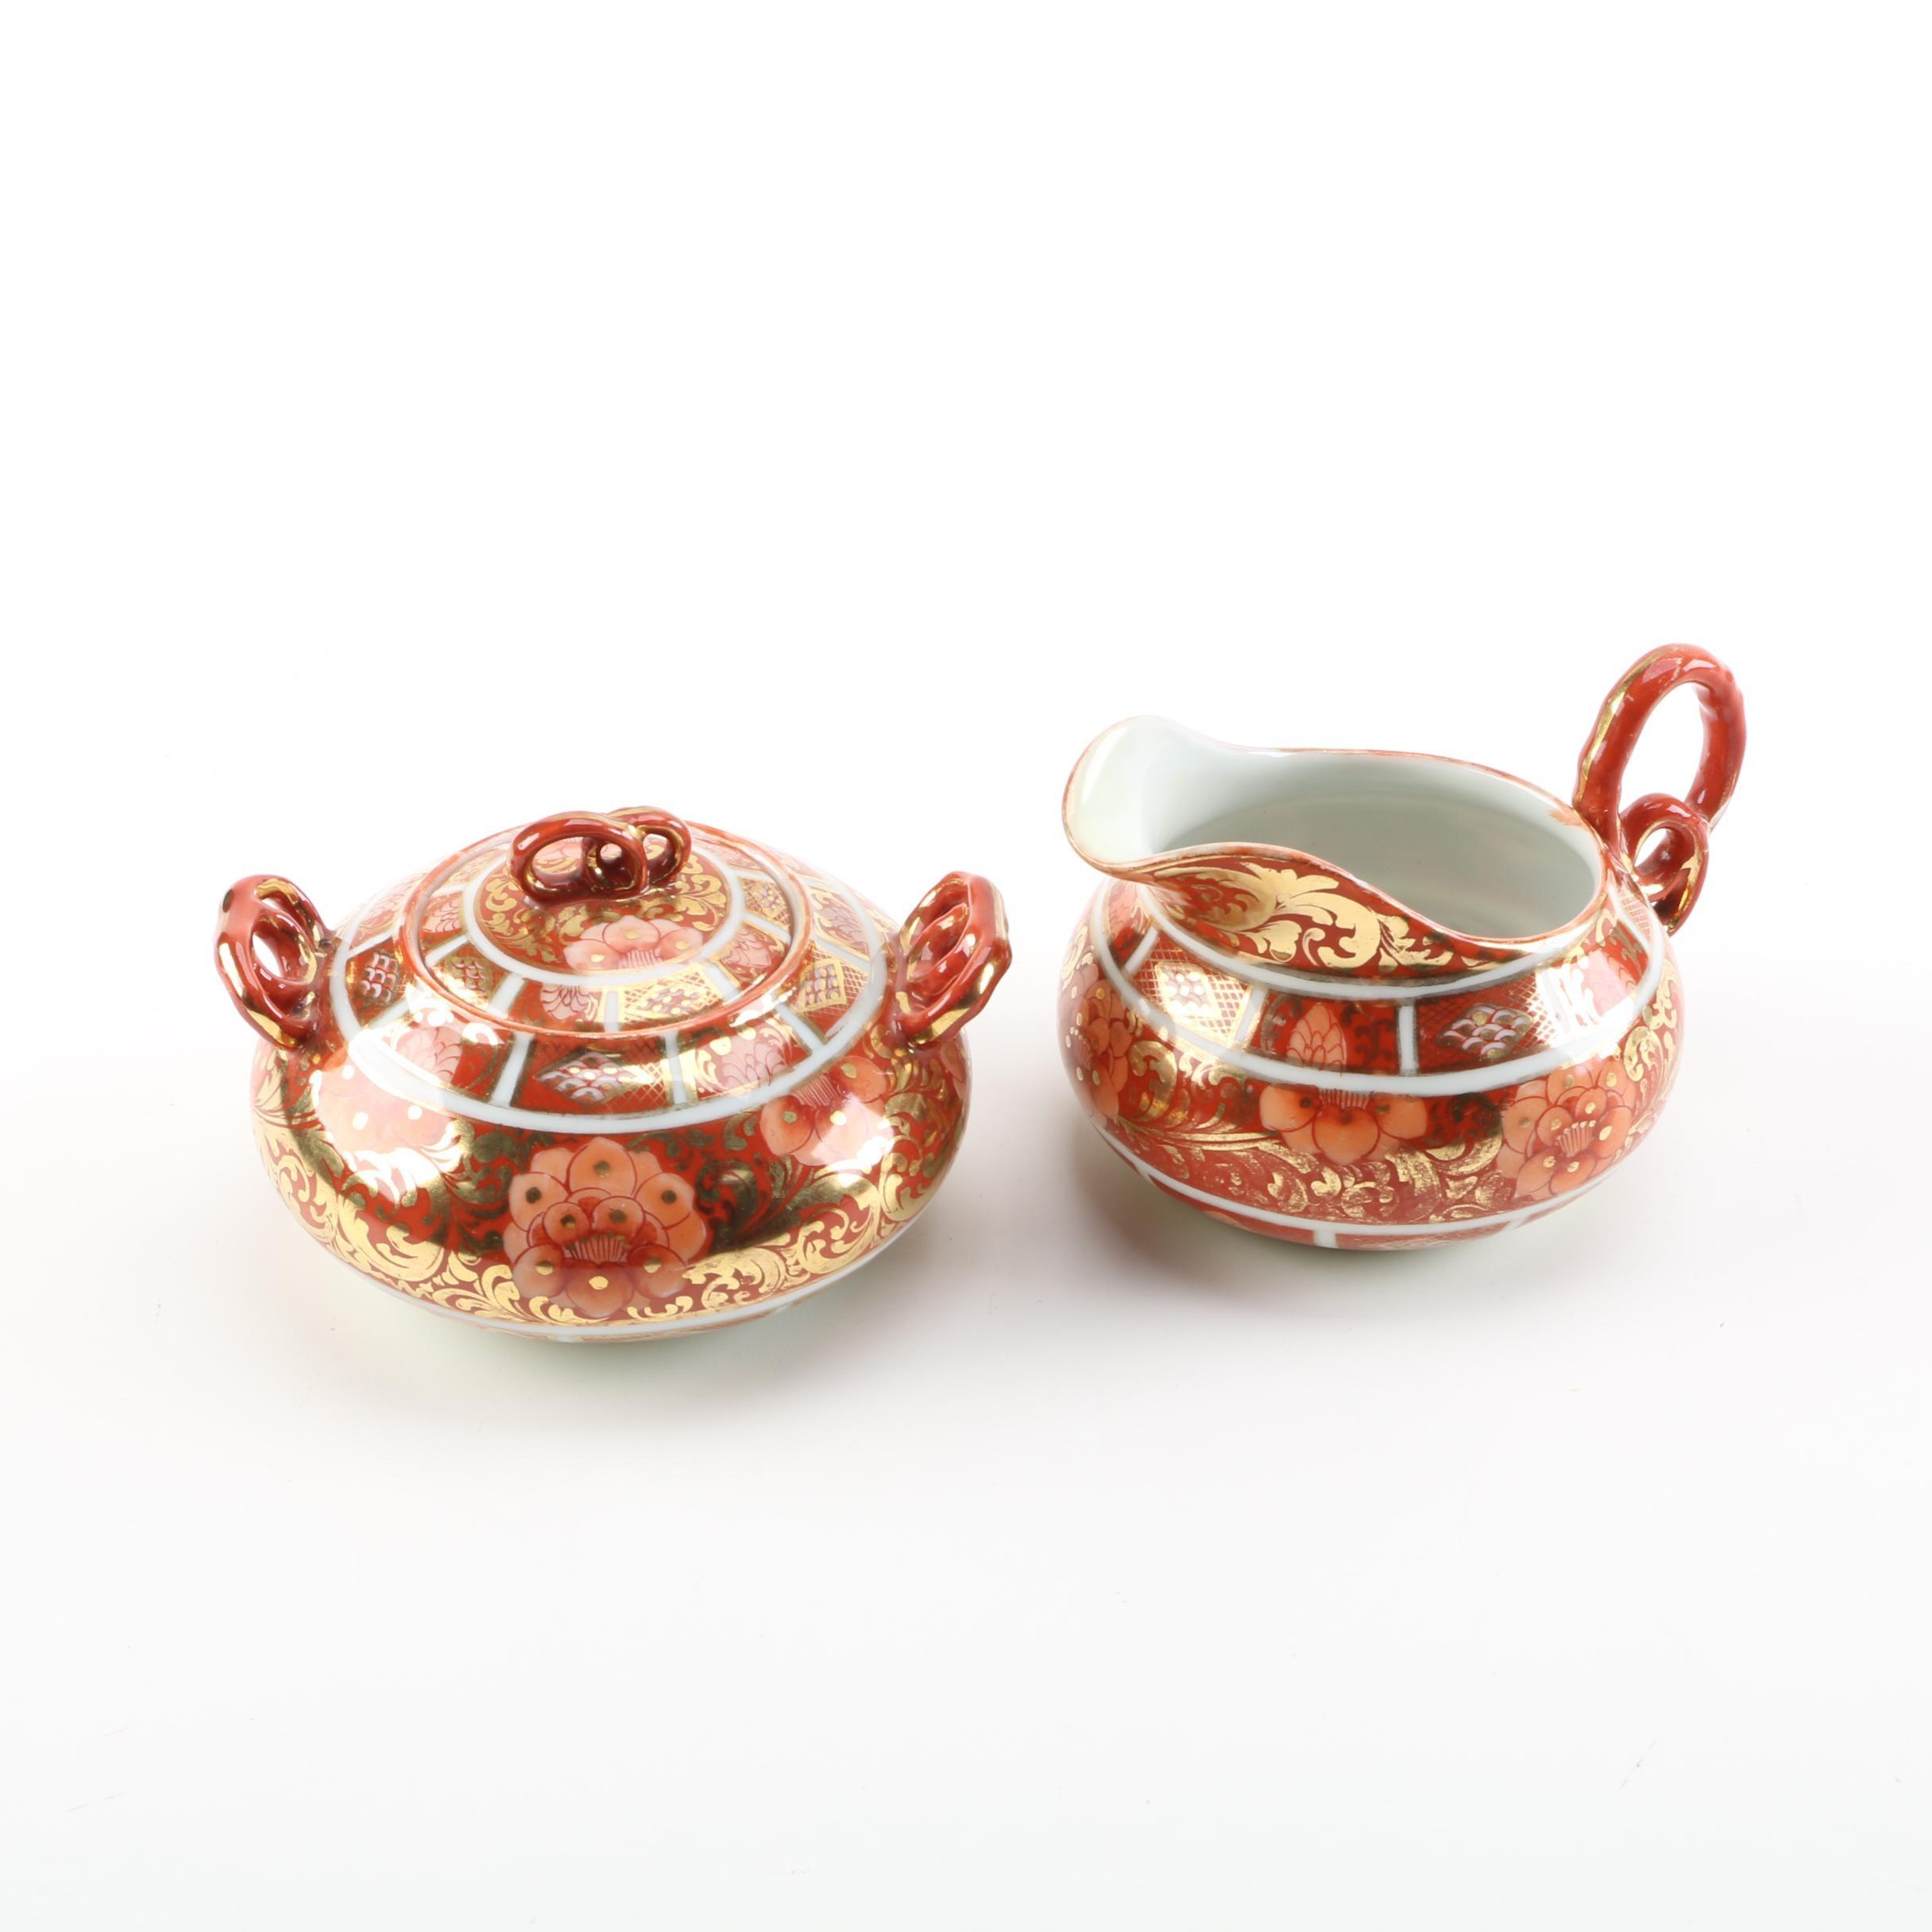 Japanese Kutani Style Porcelain Sugar Bowl And Creamer